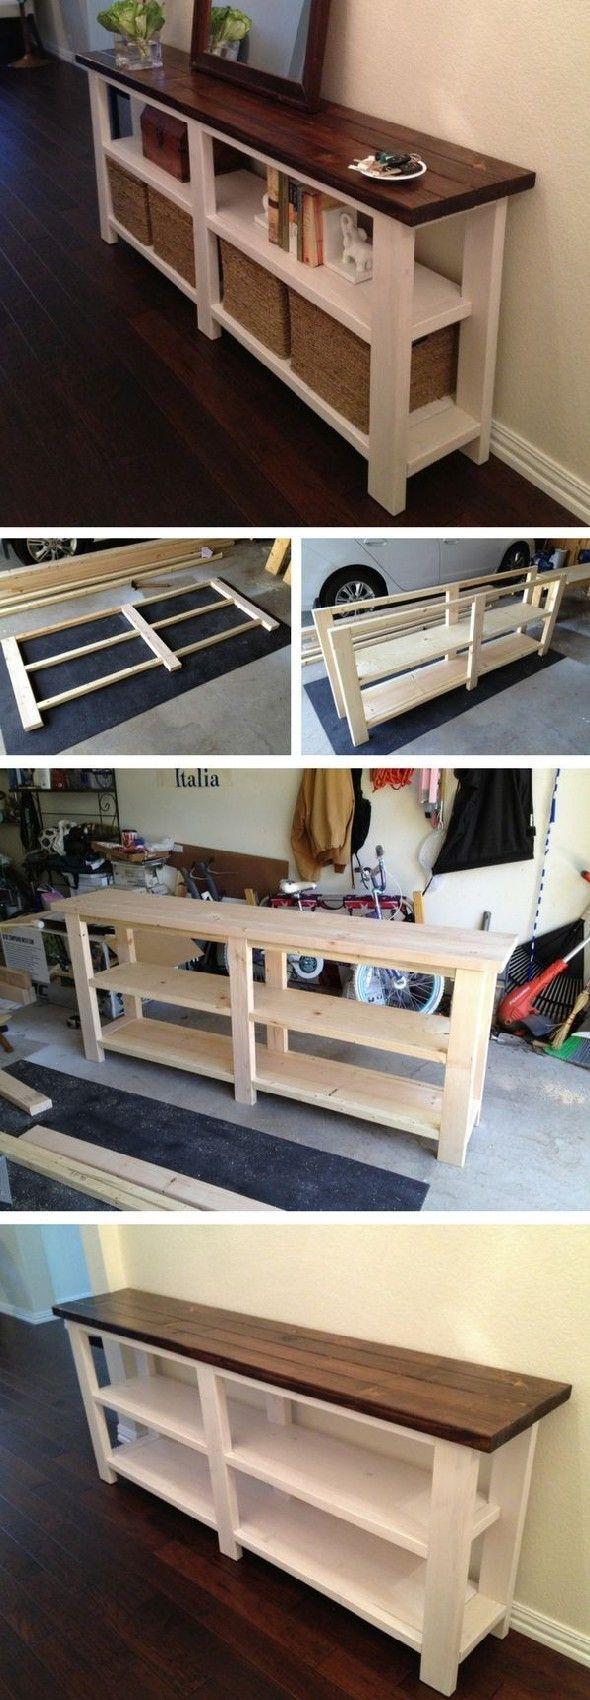 15+ Best Amazing DIY Furniture Ideas to Steal - Julien Gllmc #diymöbel